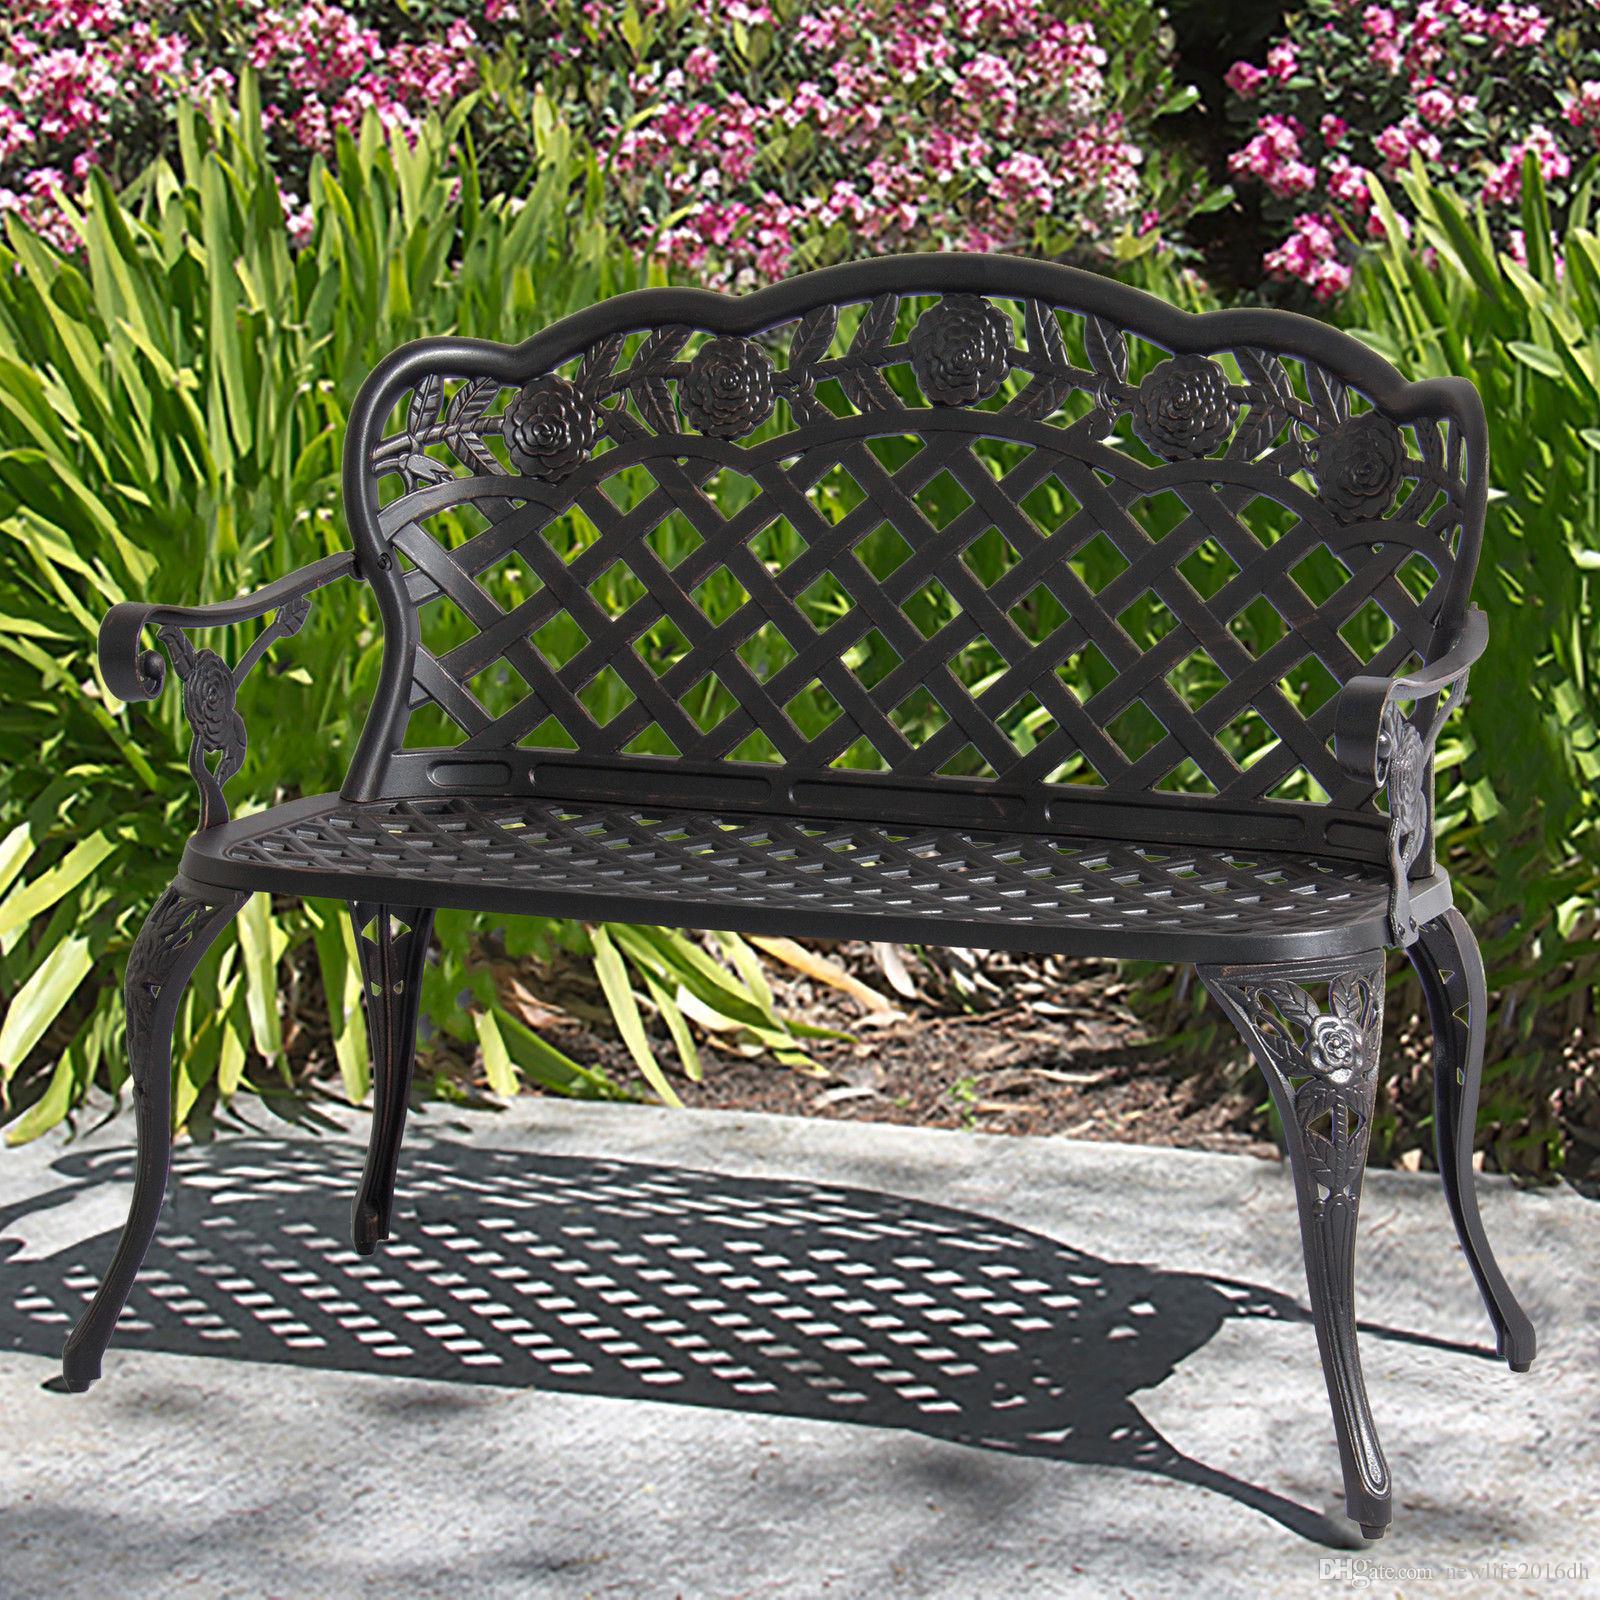 Astounding 2019 Patio Garden Bench Cast Aluminum Outdoor Garden Yard Solid Construction New From Newlife2016Dh 125 63 Dhgate Com Dailytribune Chair Design For Home Dailytribuneorg